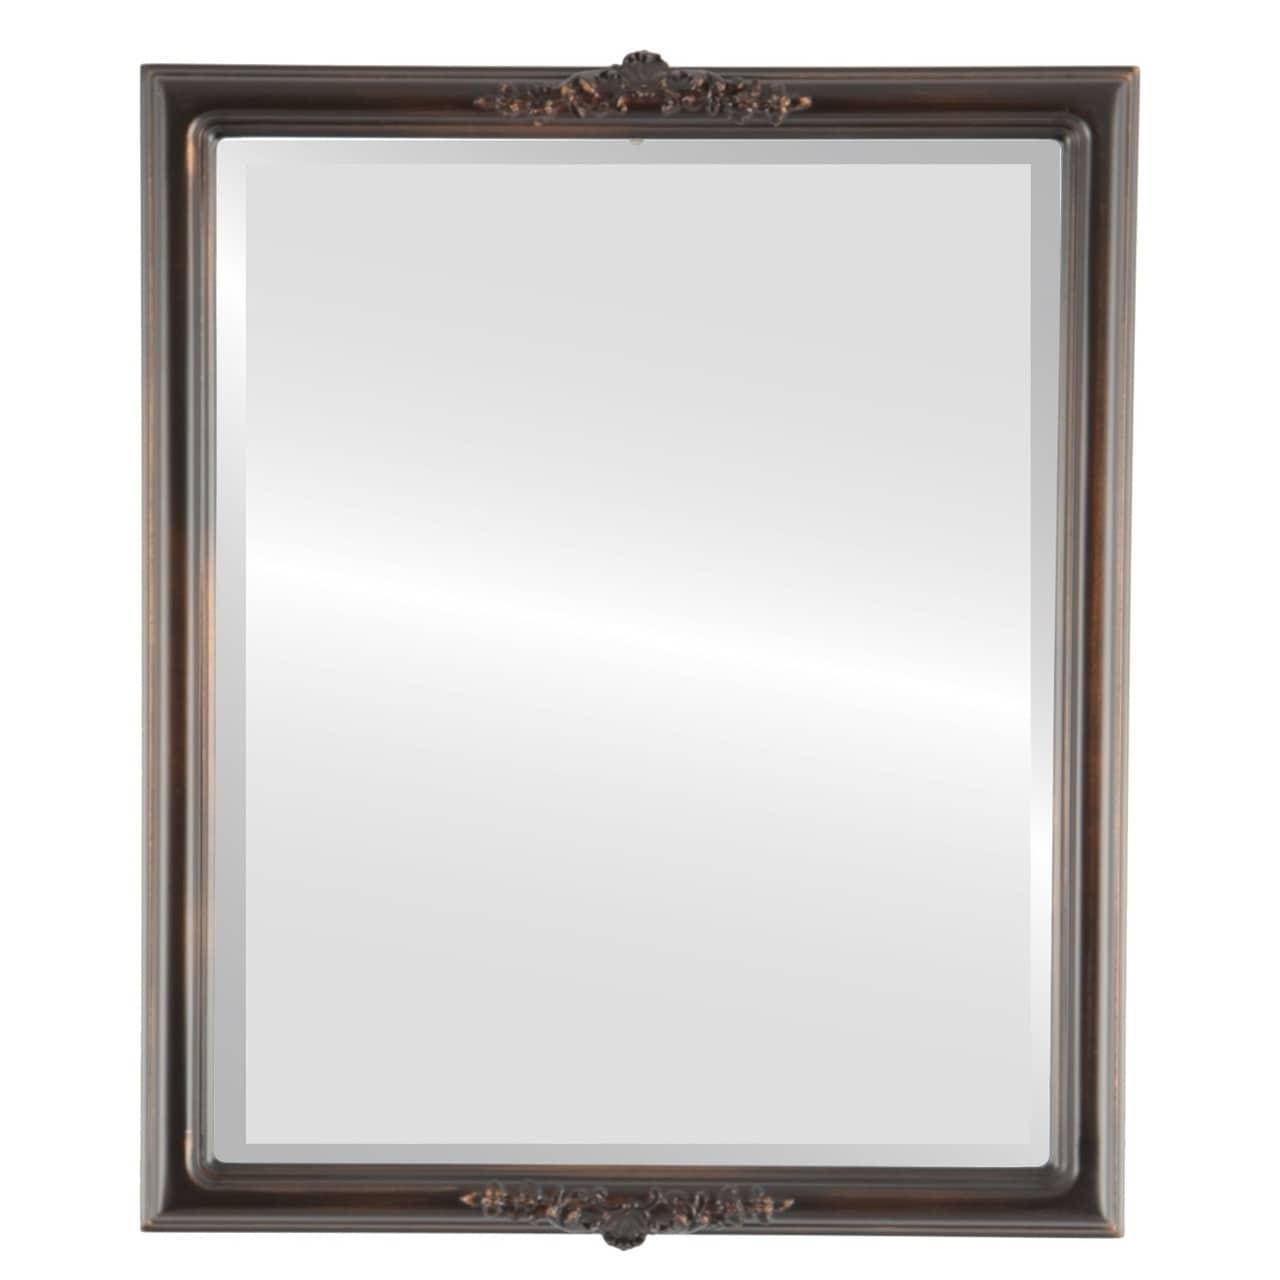 Contessa Framed Rectangle Mirror in Rubbed Bronze - Antique Bronze (17x21)